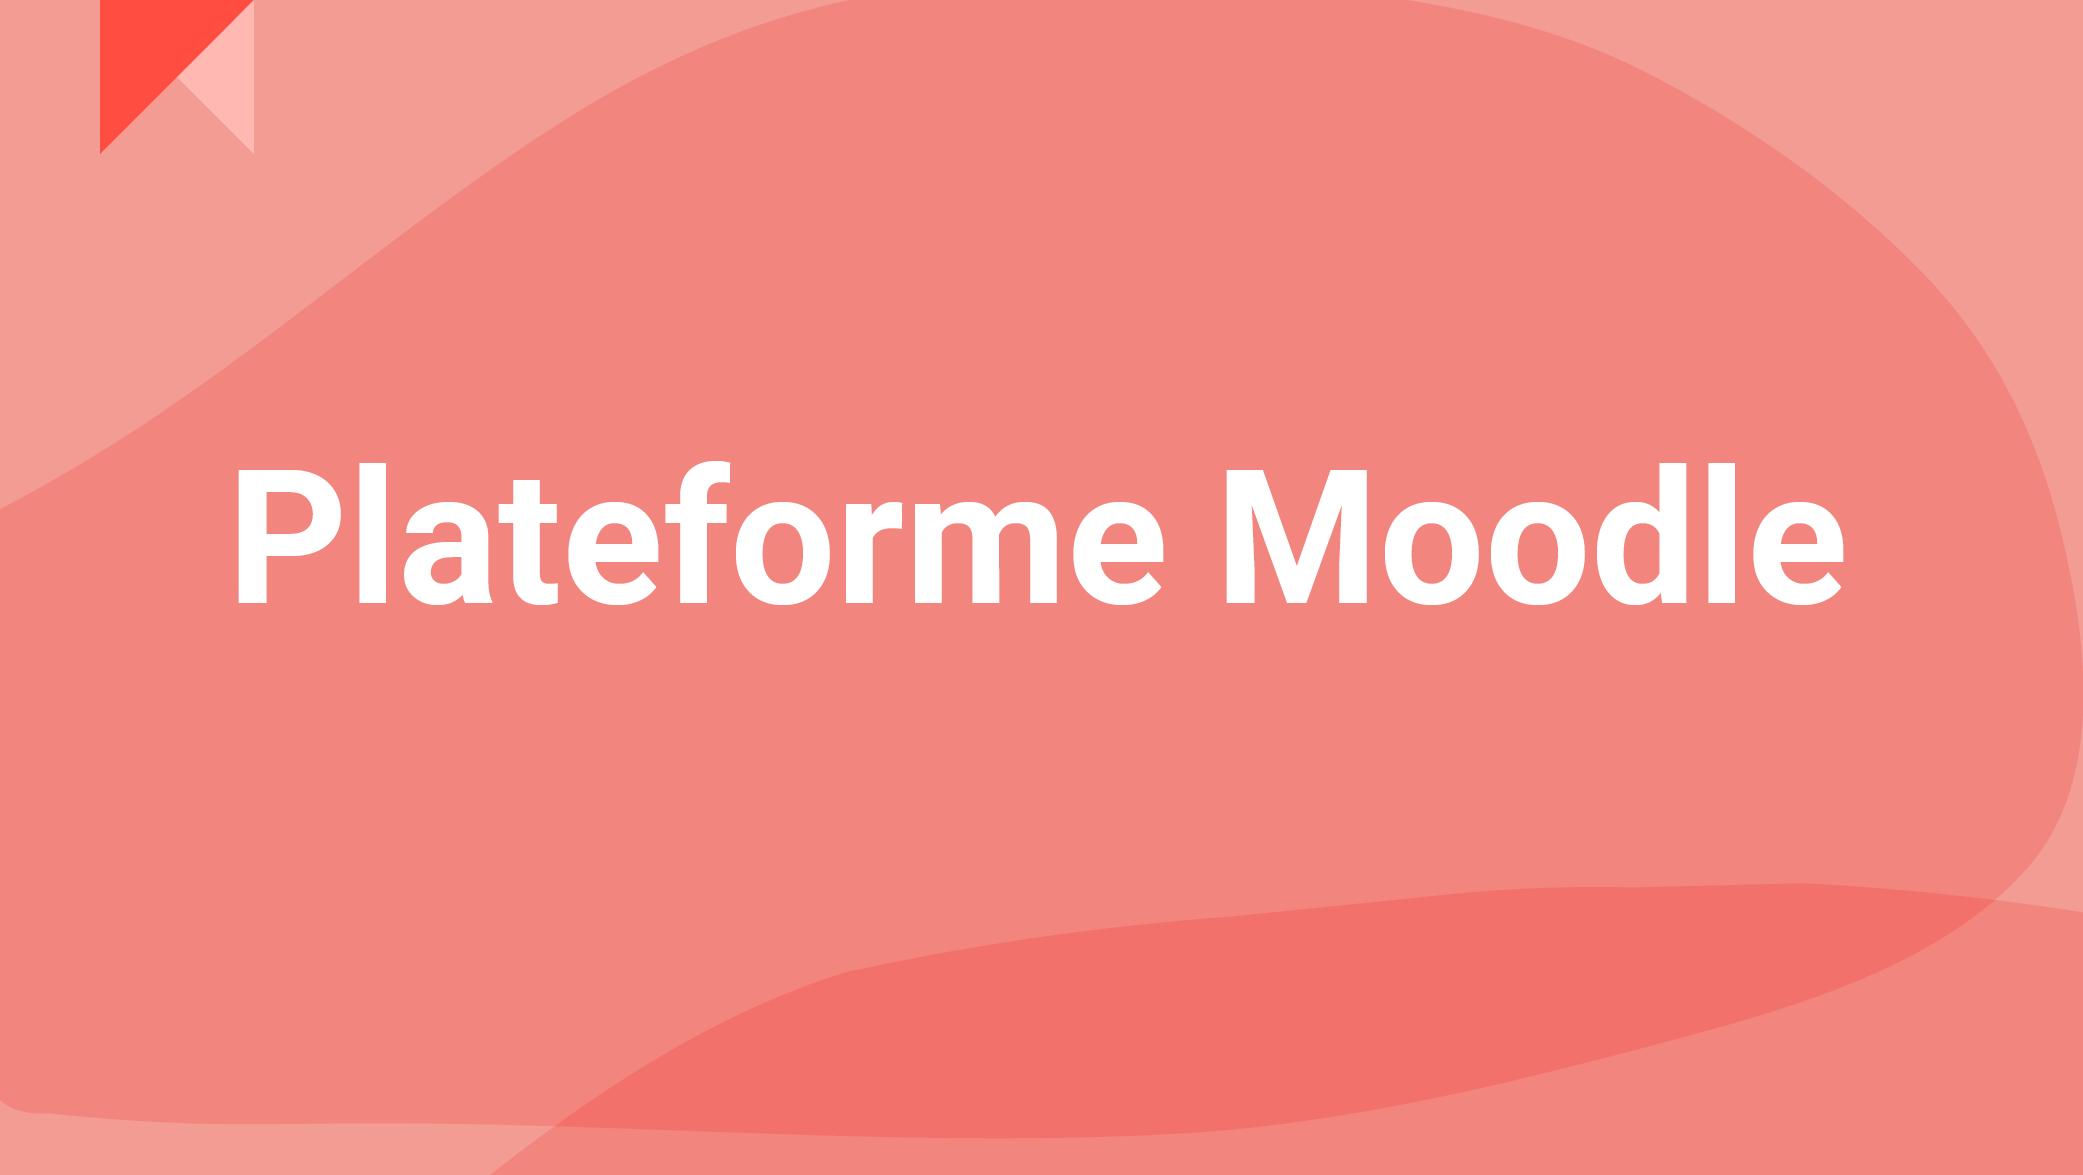 Plateforme Moodle